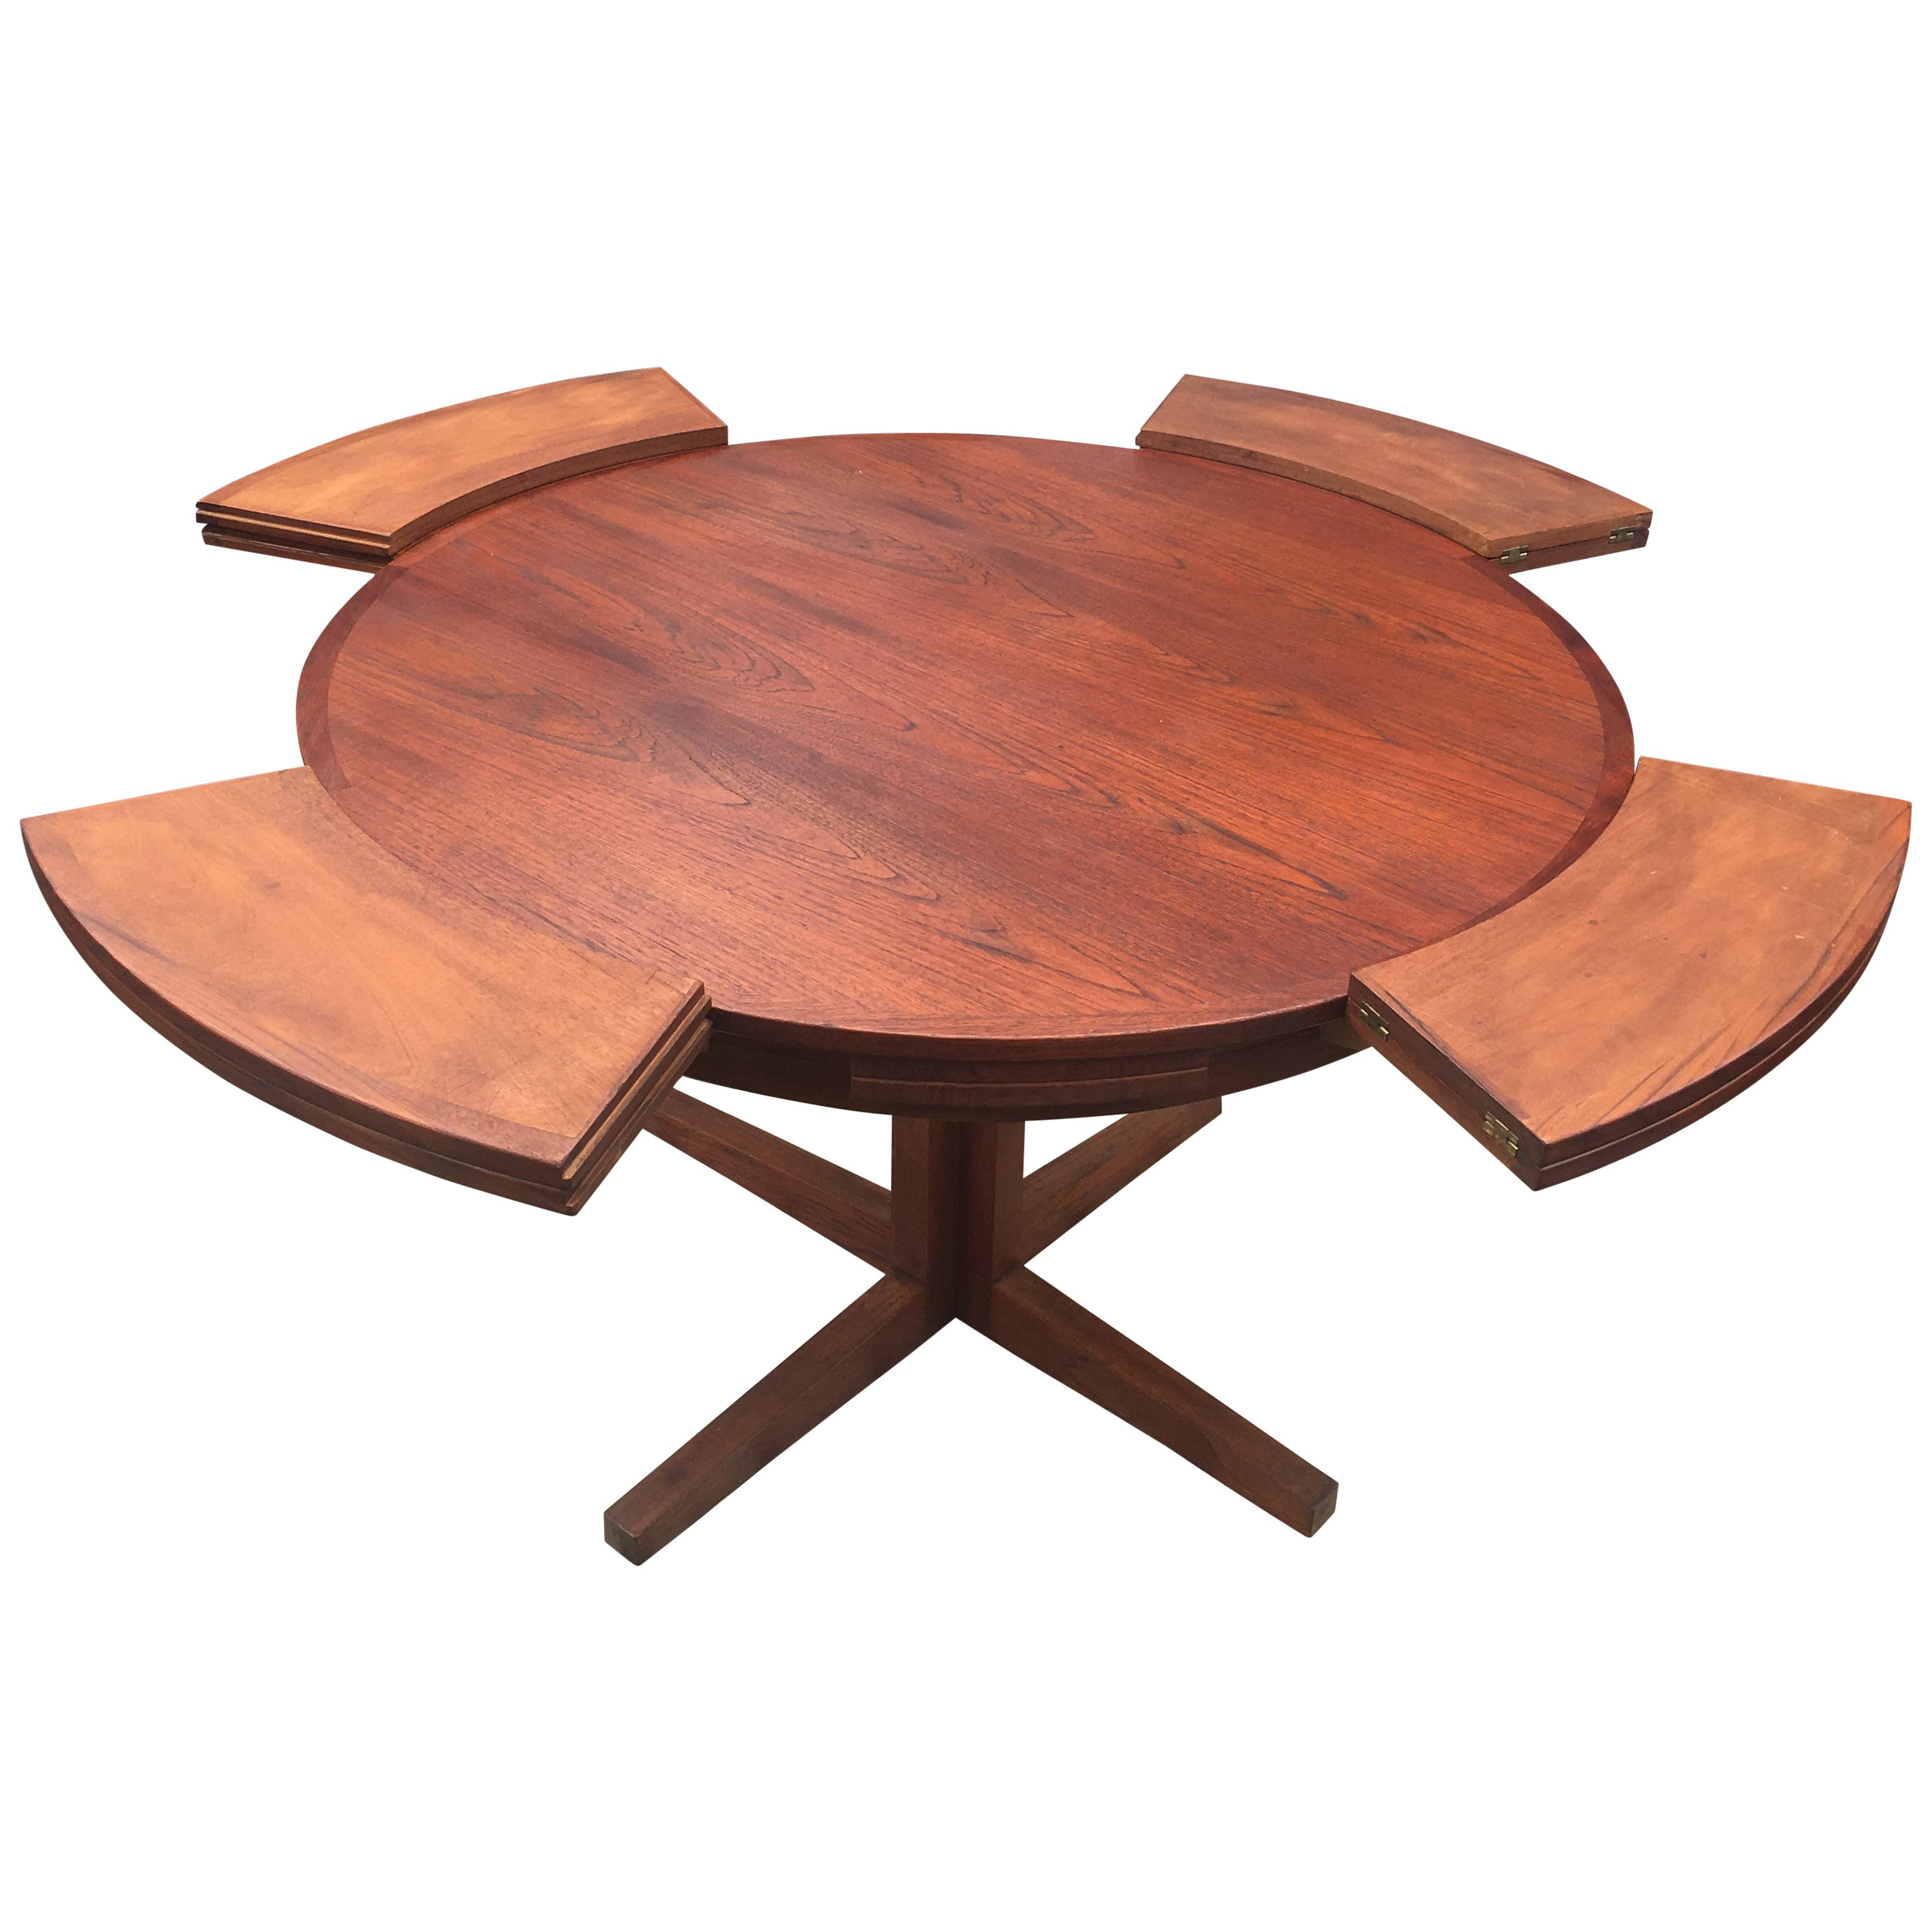 Lotus Or Flip Flap Extending Circular Dining Table By Dyrlund In Teak At 1stdibs